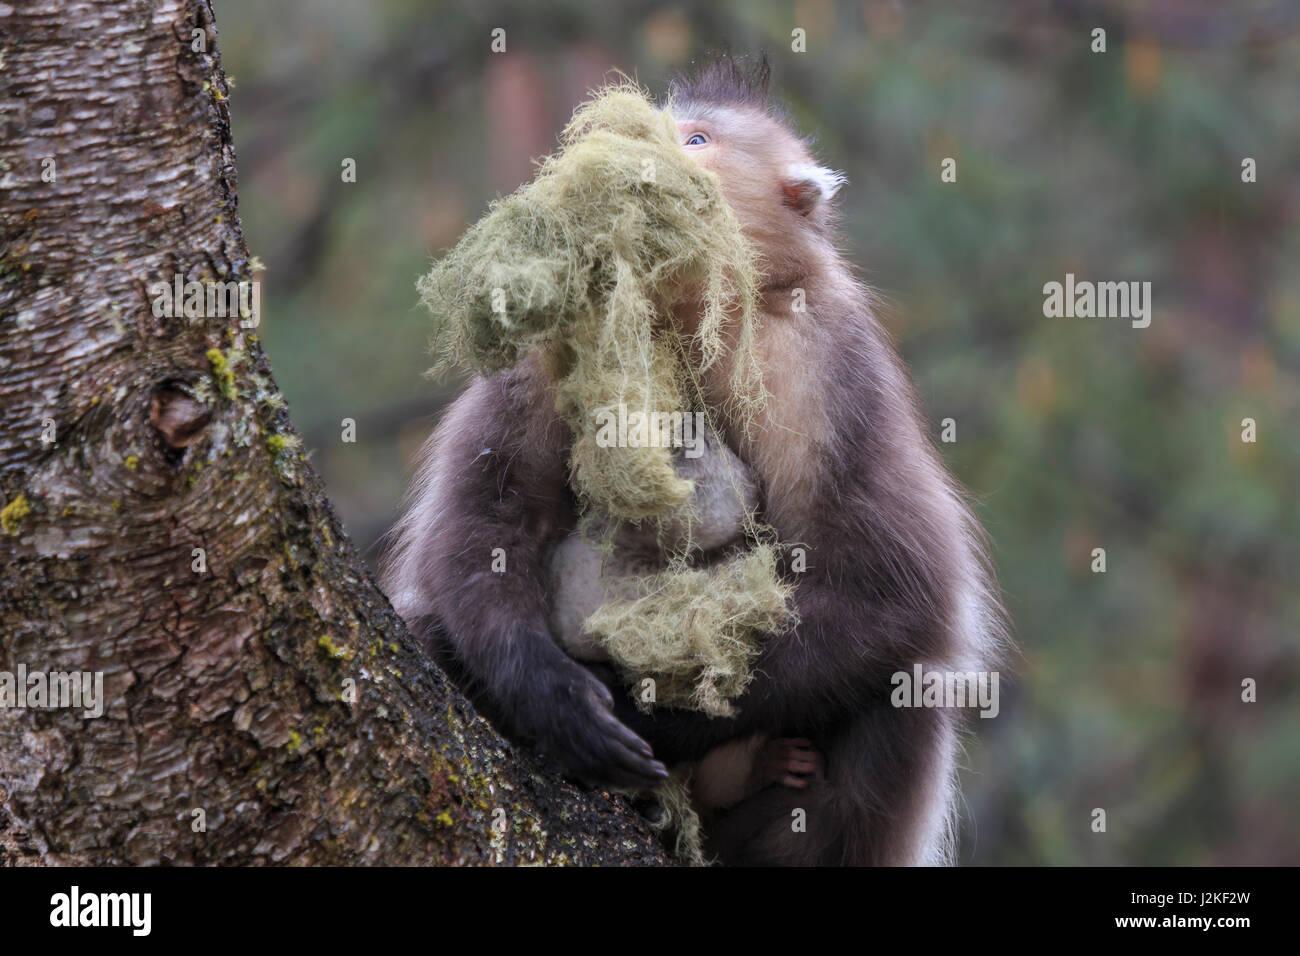 Yunnan Black Snub-Nosed Monkey (Rhinopithecus Bieti) Stock Photo